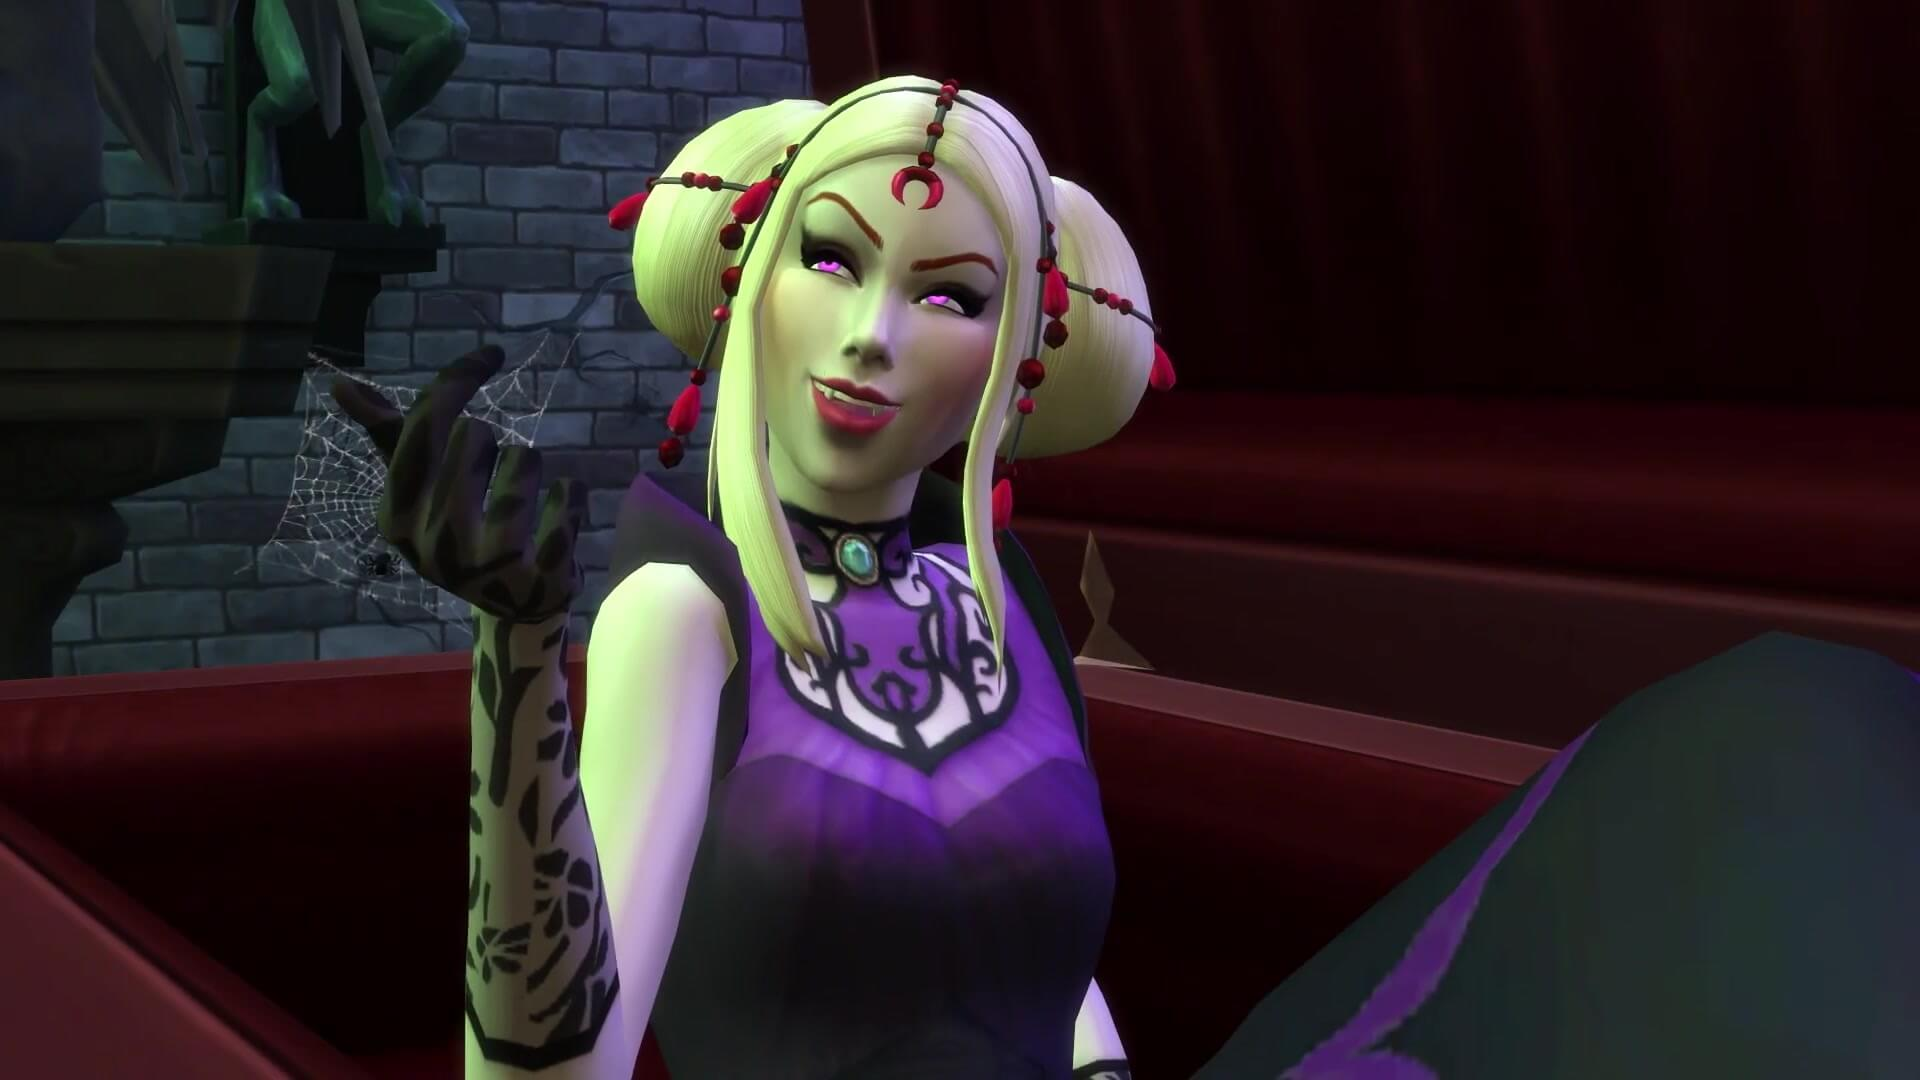 Sims 4 Vampire Cheats